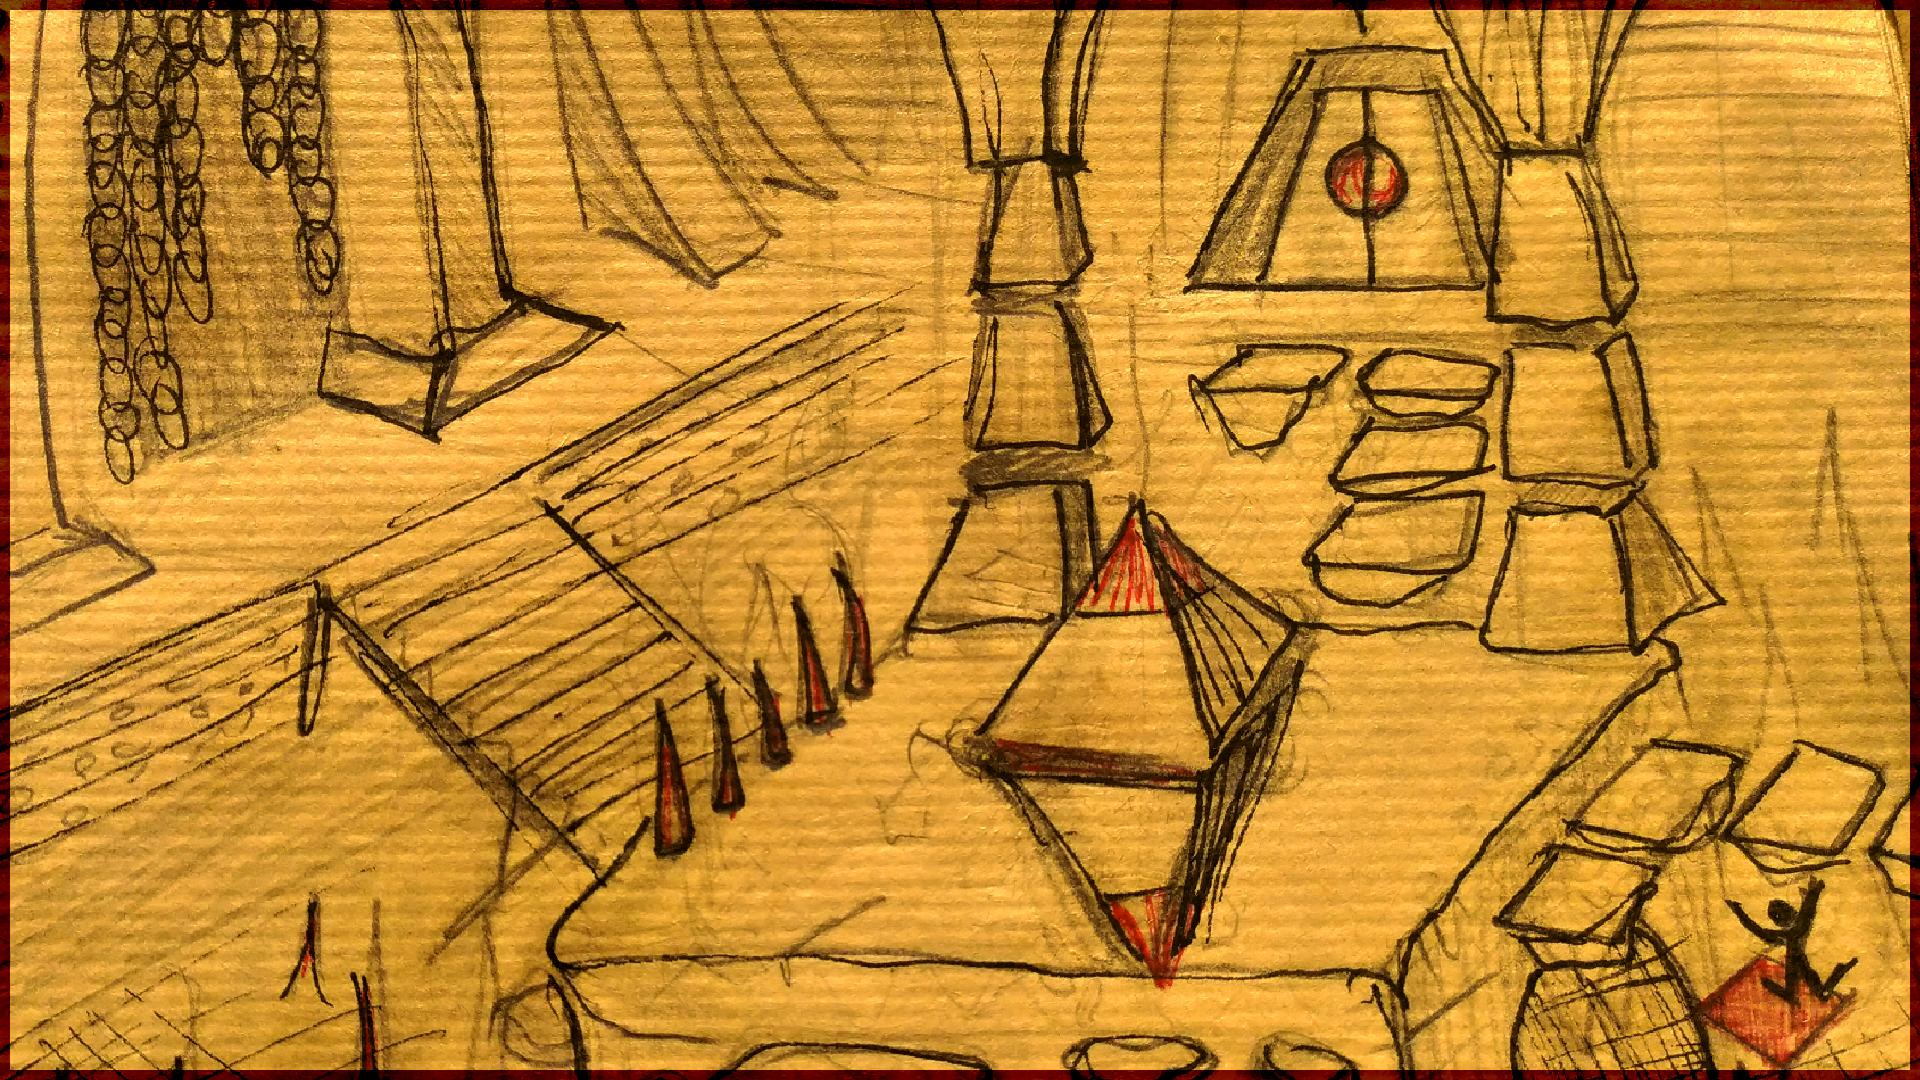 Concept 1 - Gameplay